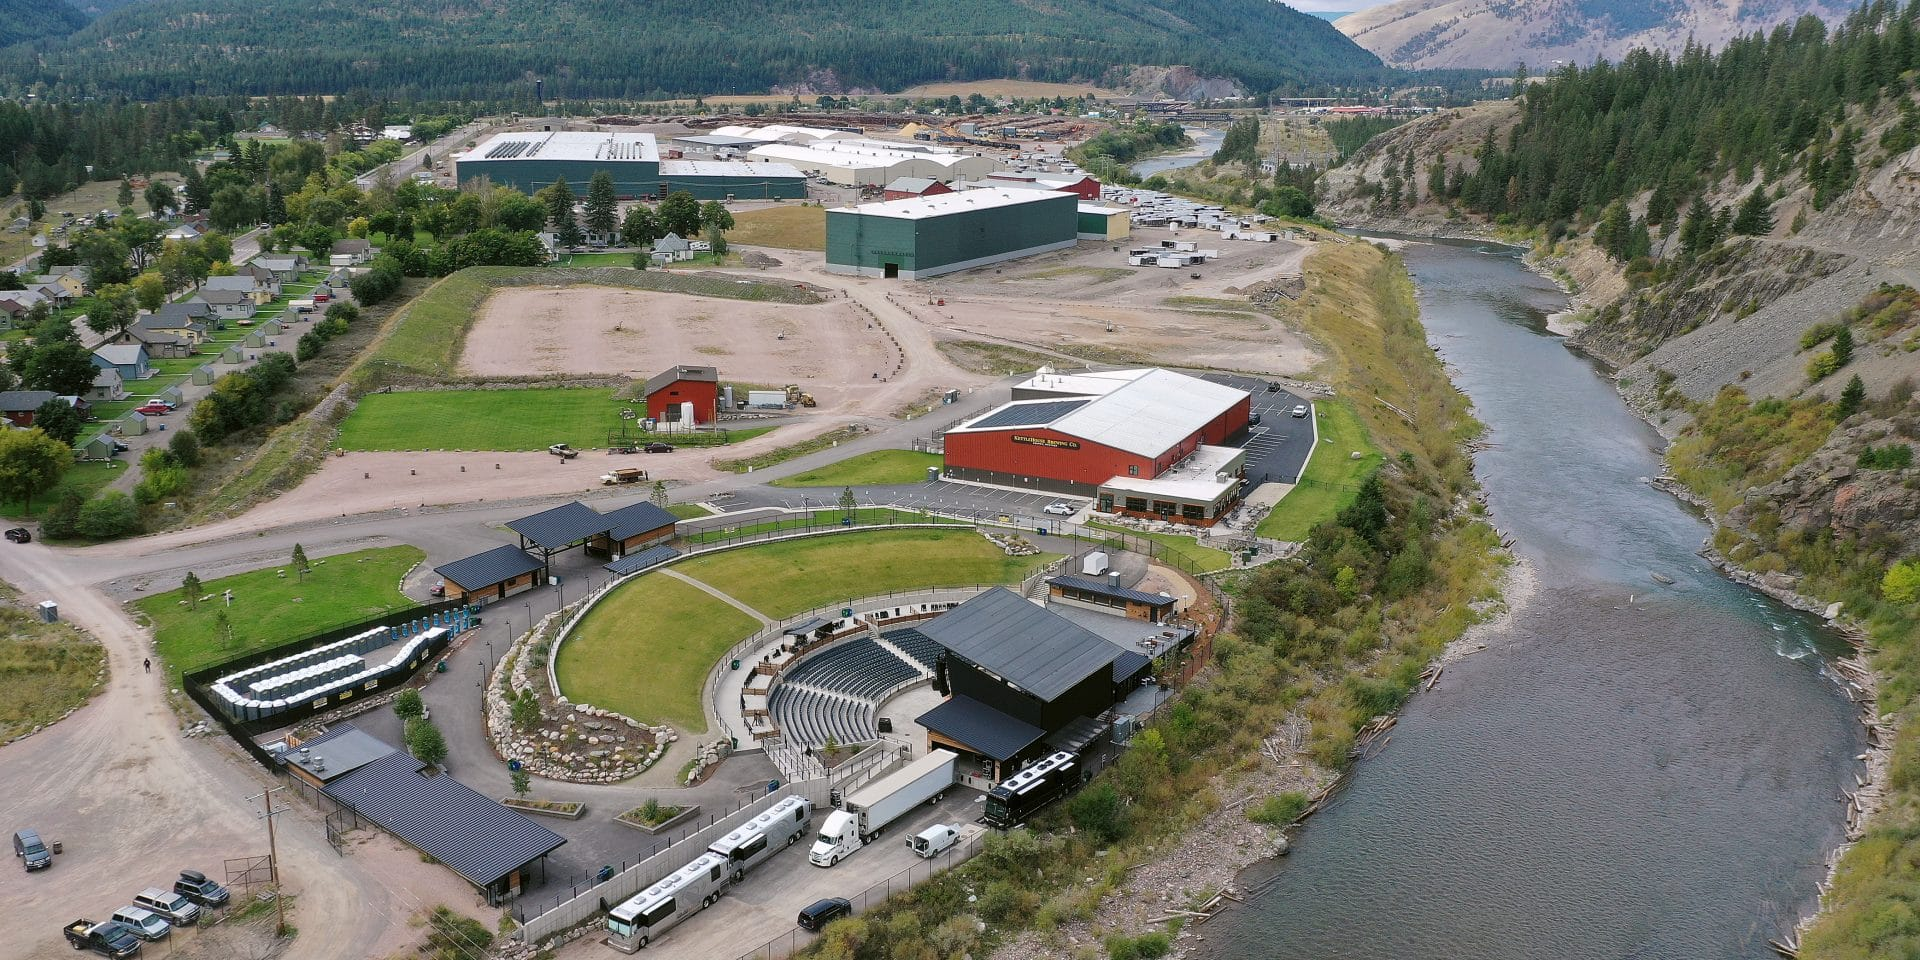 Logjammed: Montana's Hottest Promoter Plots Comeback